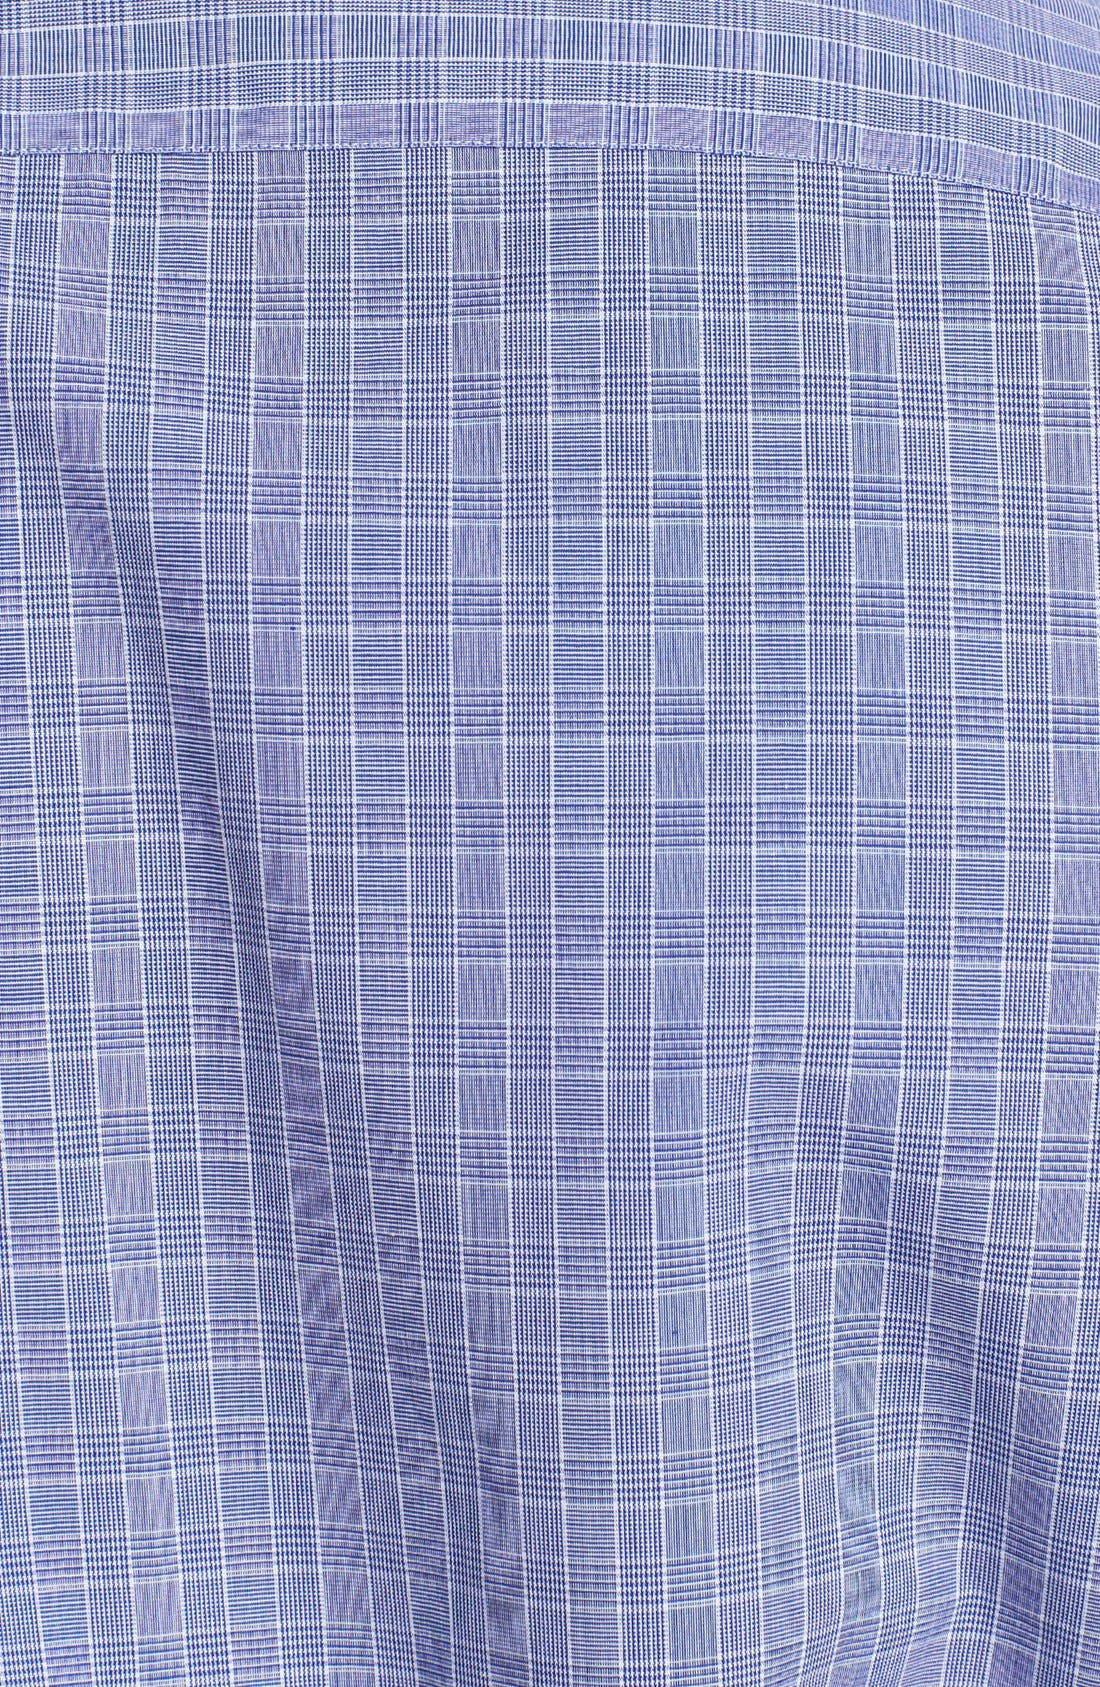 Alternate Image 3  - Z Zegna Slim Fit Glen Plaid Woven Shirt